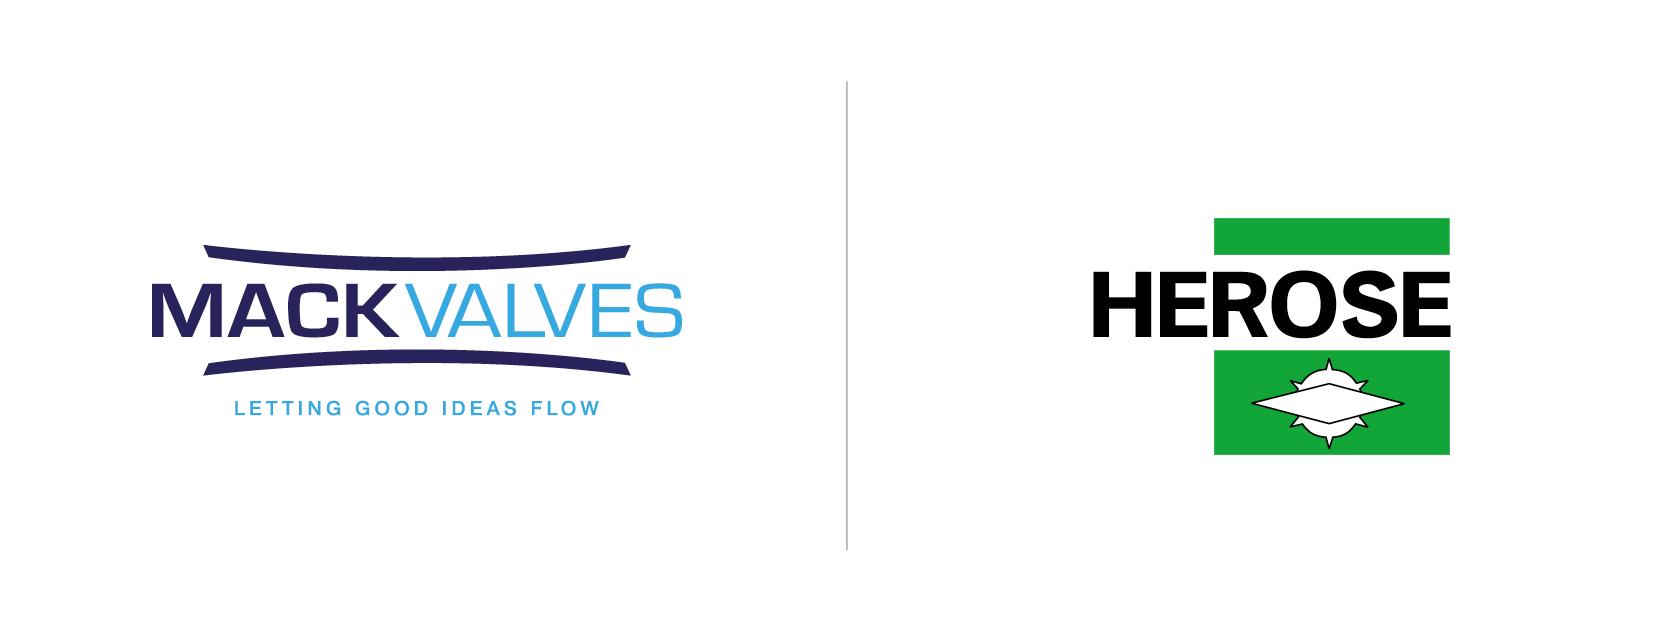 HEROSE and Mack Valves logos on a white background